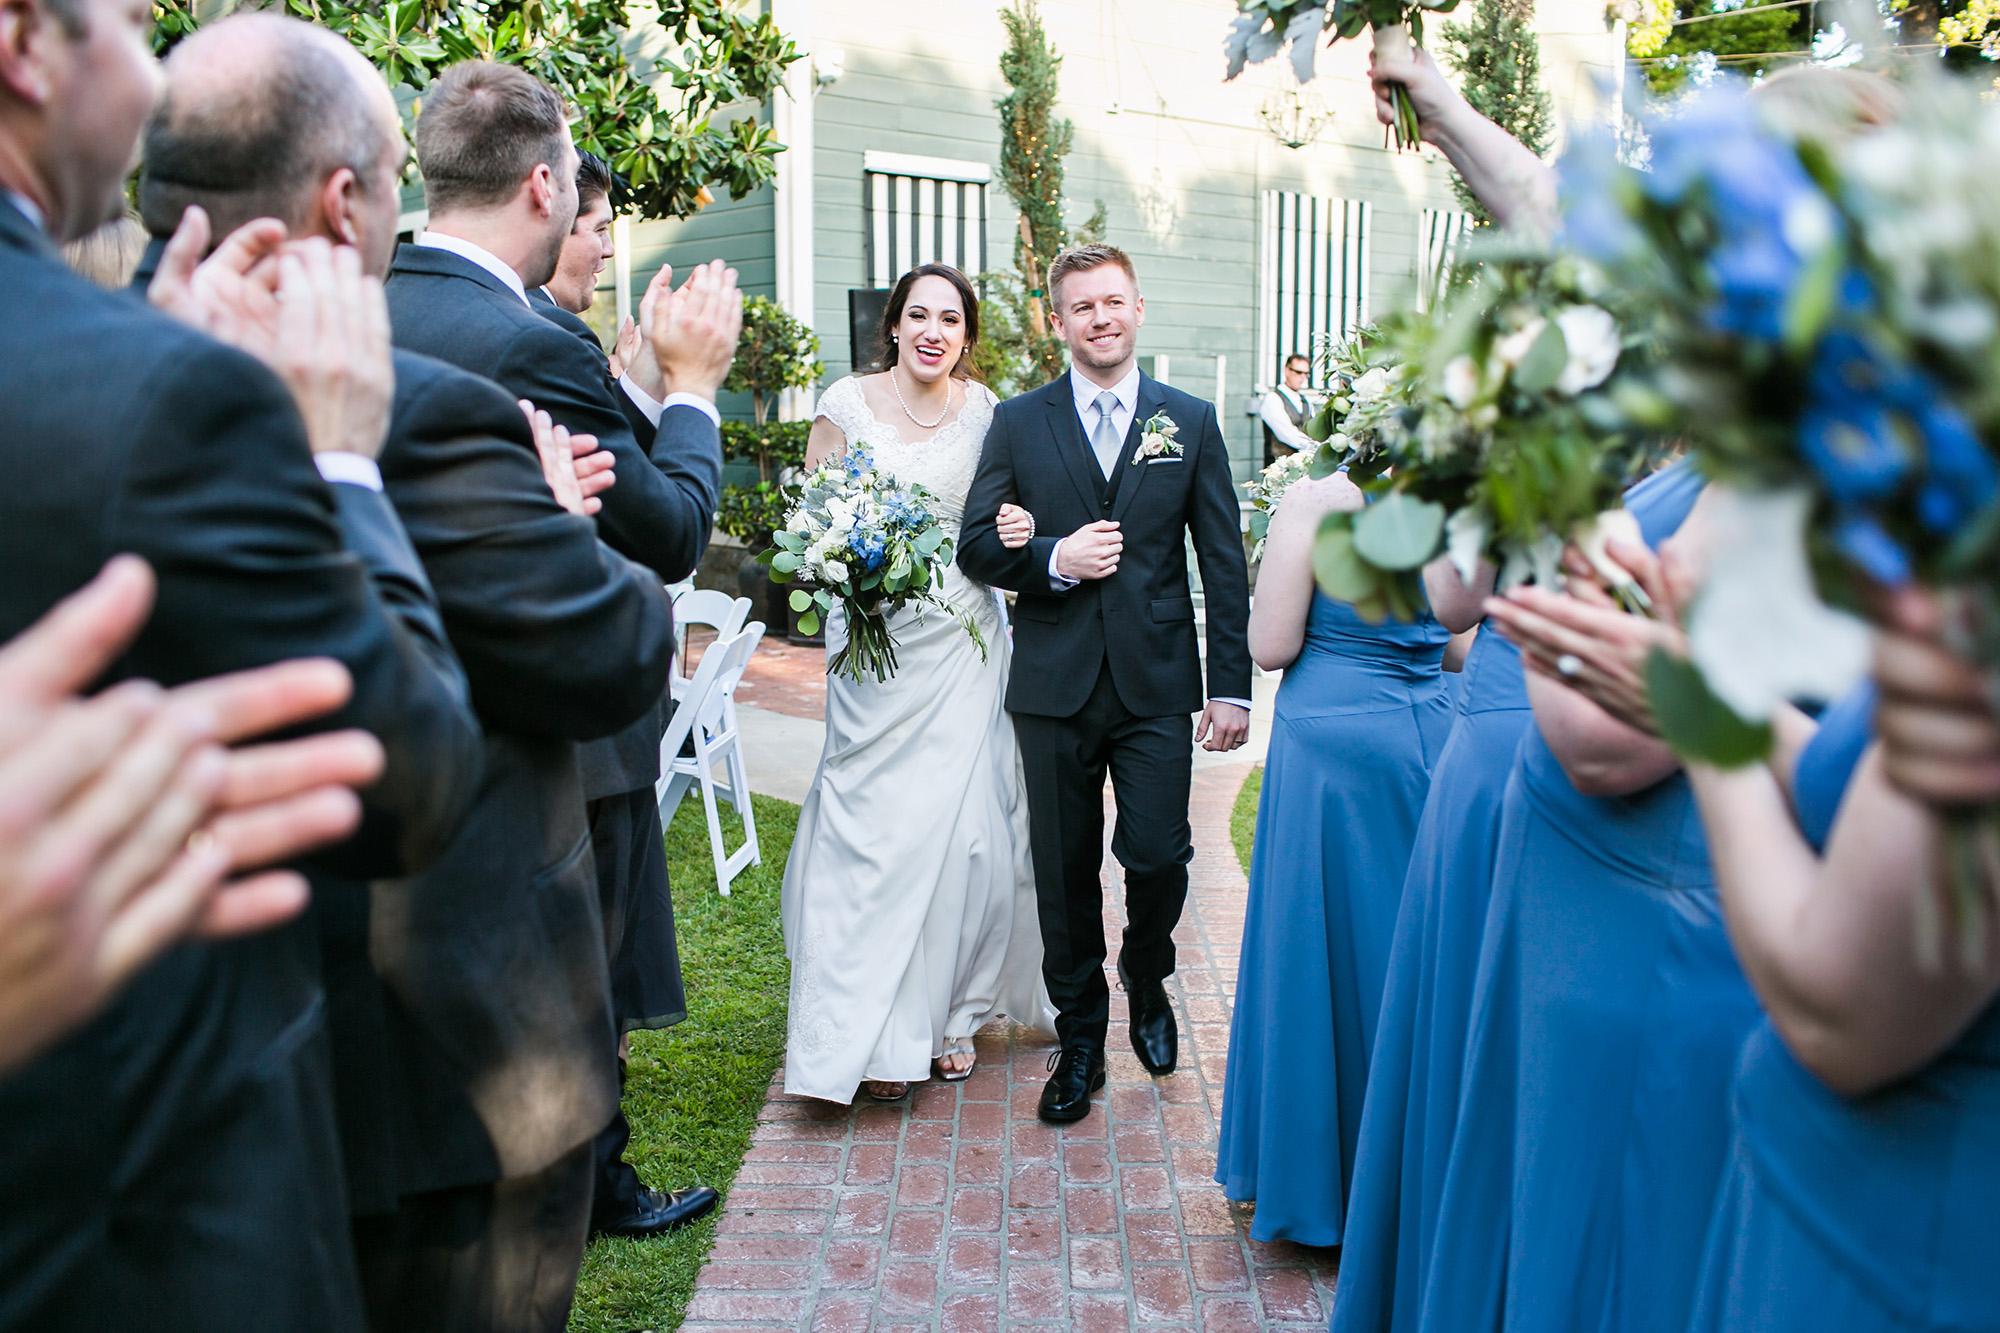 associate-photographer-christmas-house-wedding-carrie-vines-0090.jpg